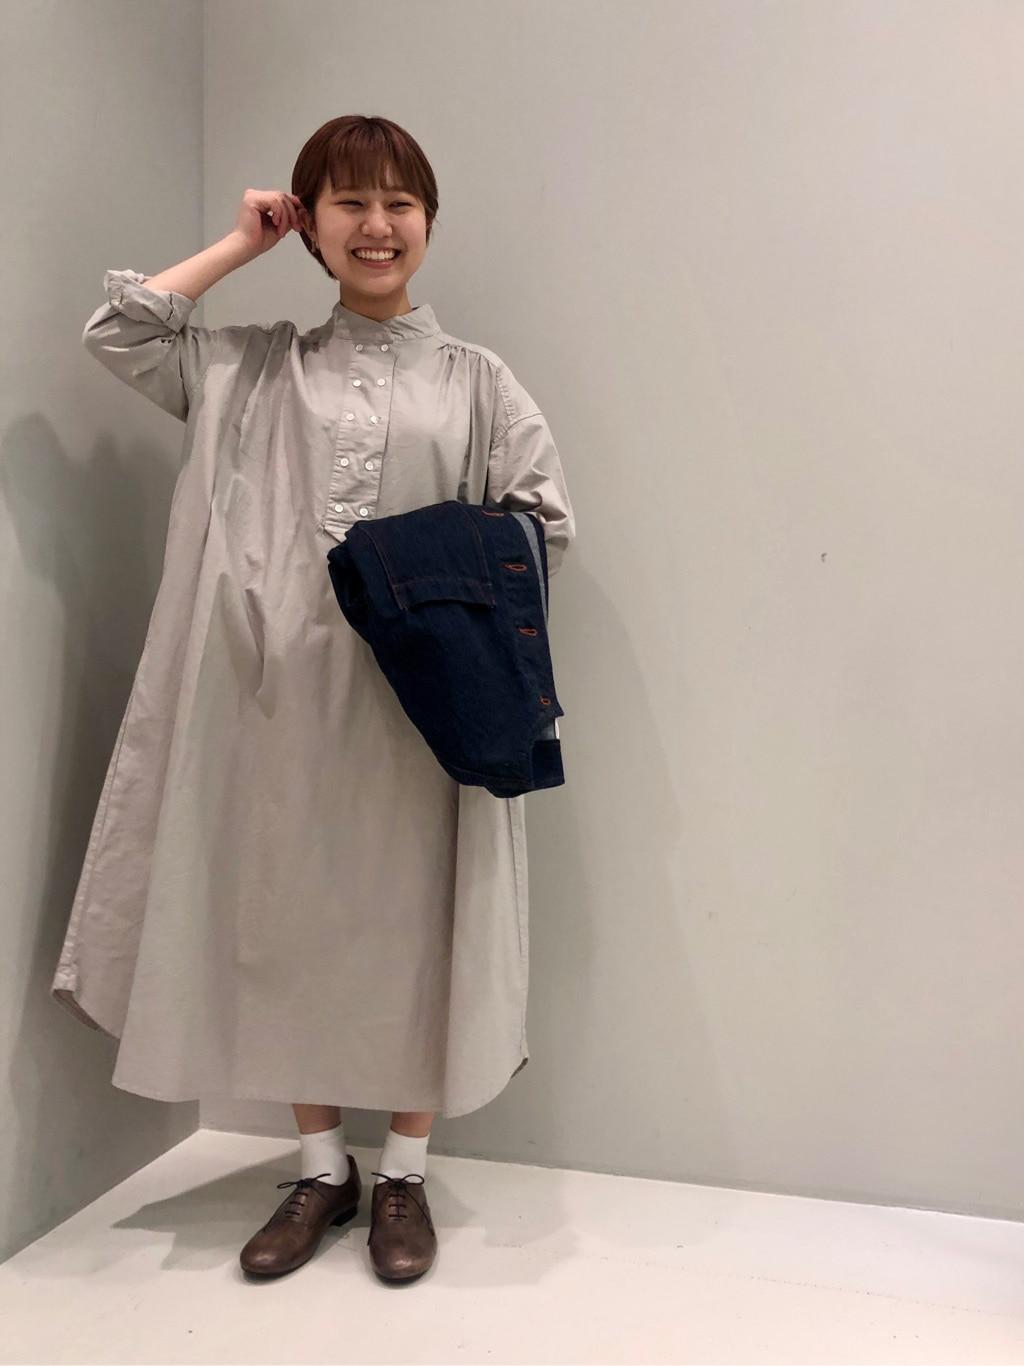 bulle de savon なんばシティ 身長:149cm 2020.09.14